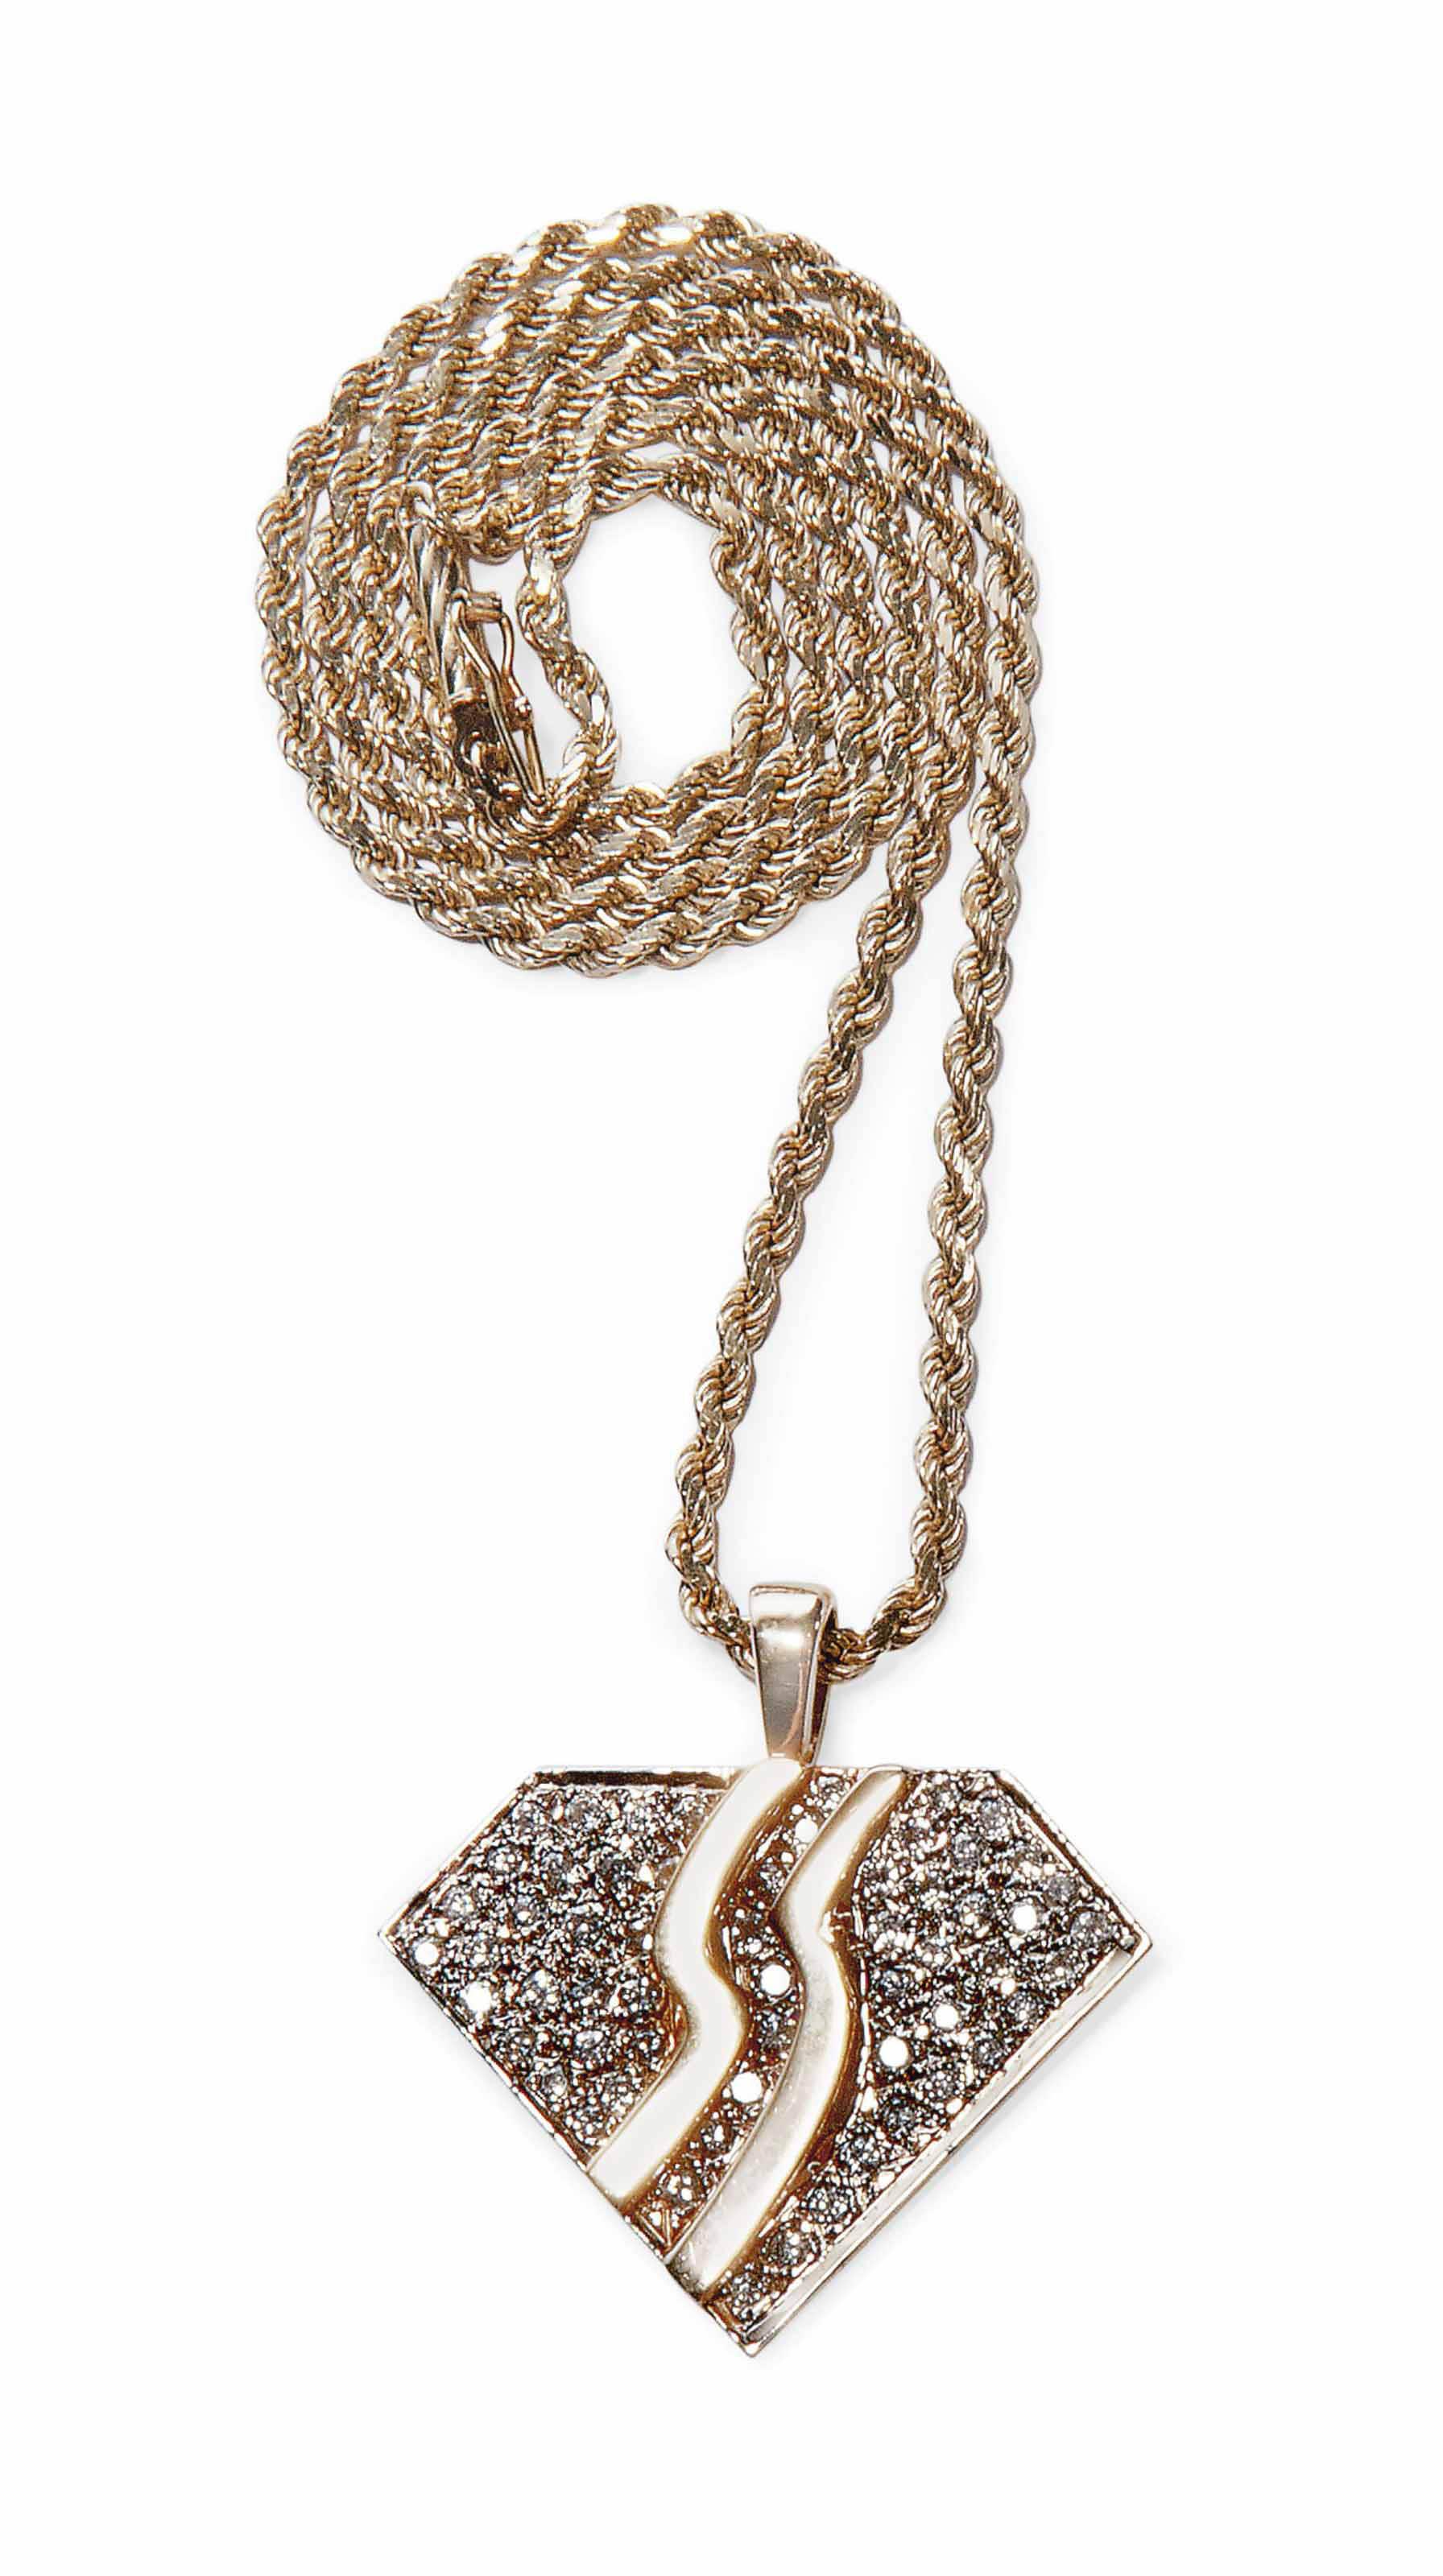 Jon Bon Jovi Necklace Pendant